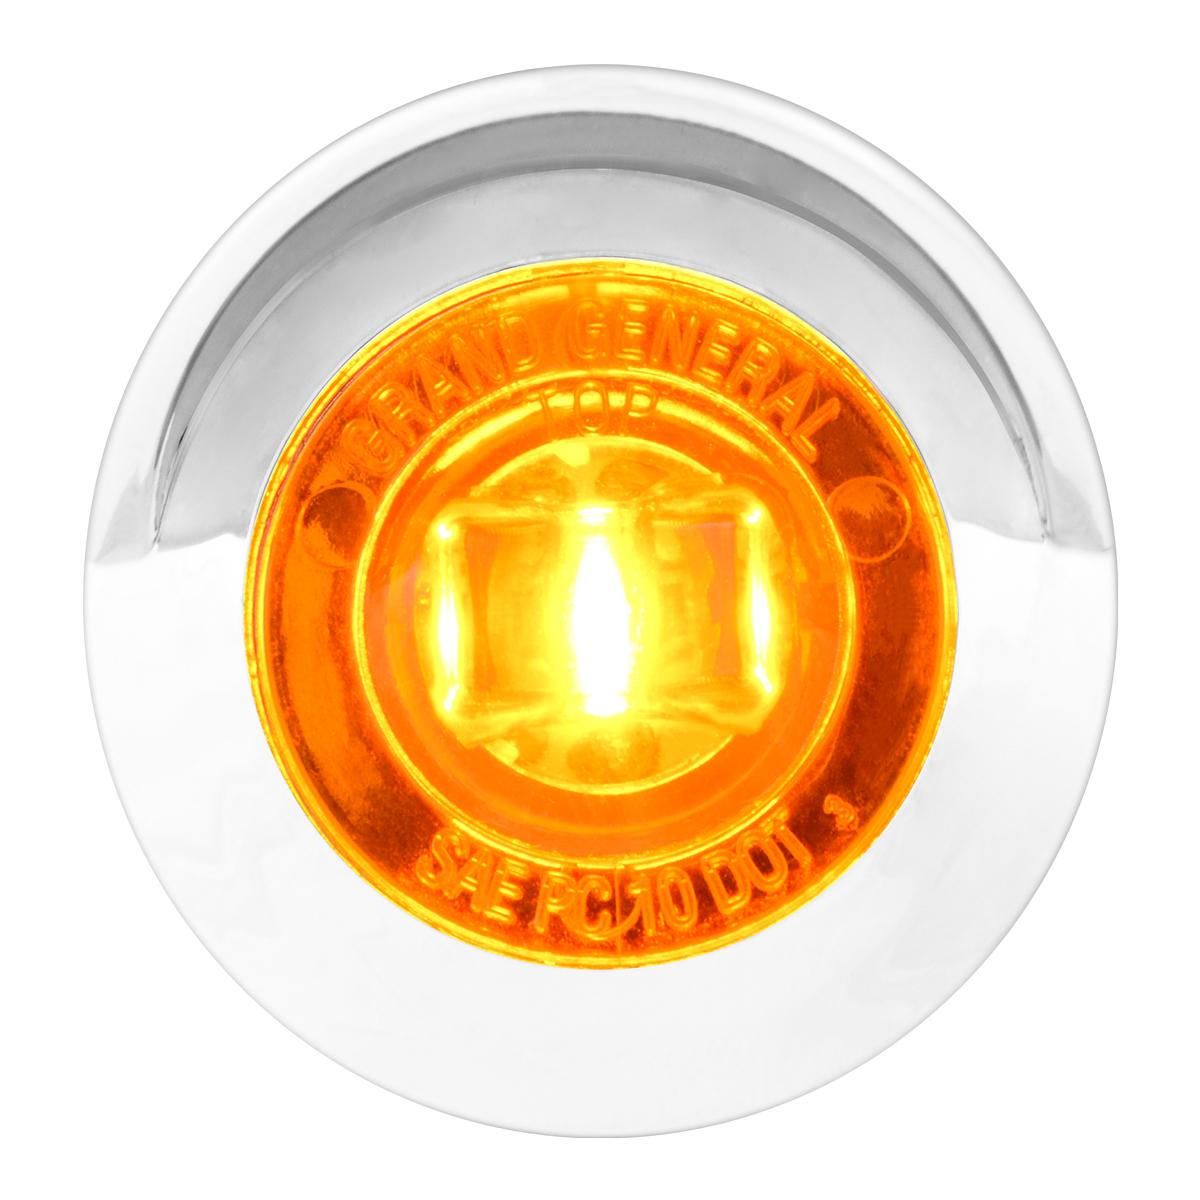 "75230 1-1/4"" Dia. Dual Function LED Light with Chrome Plastic Bezel w/ Visor and Nut"